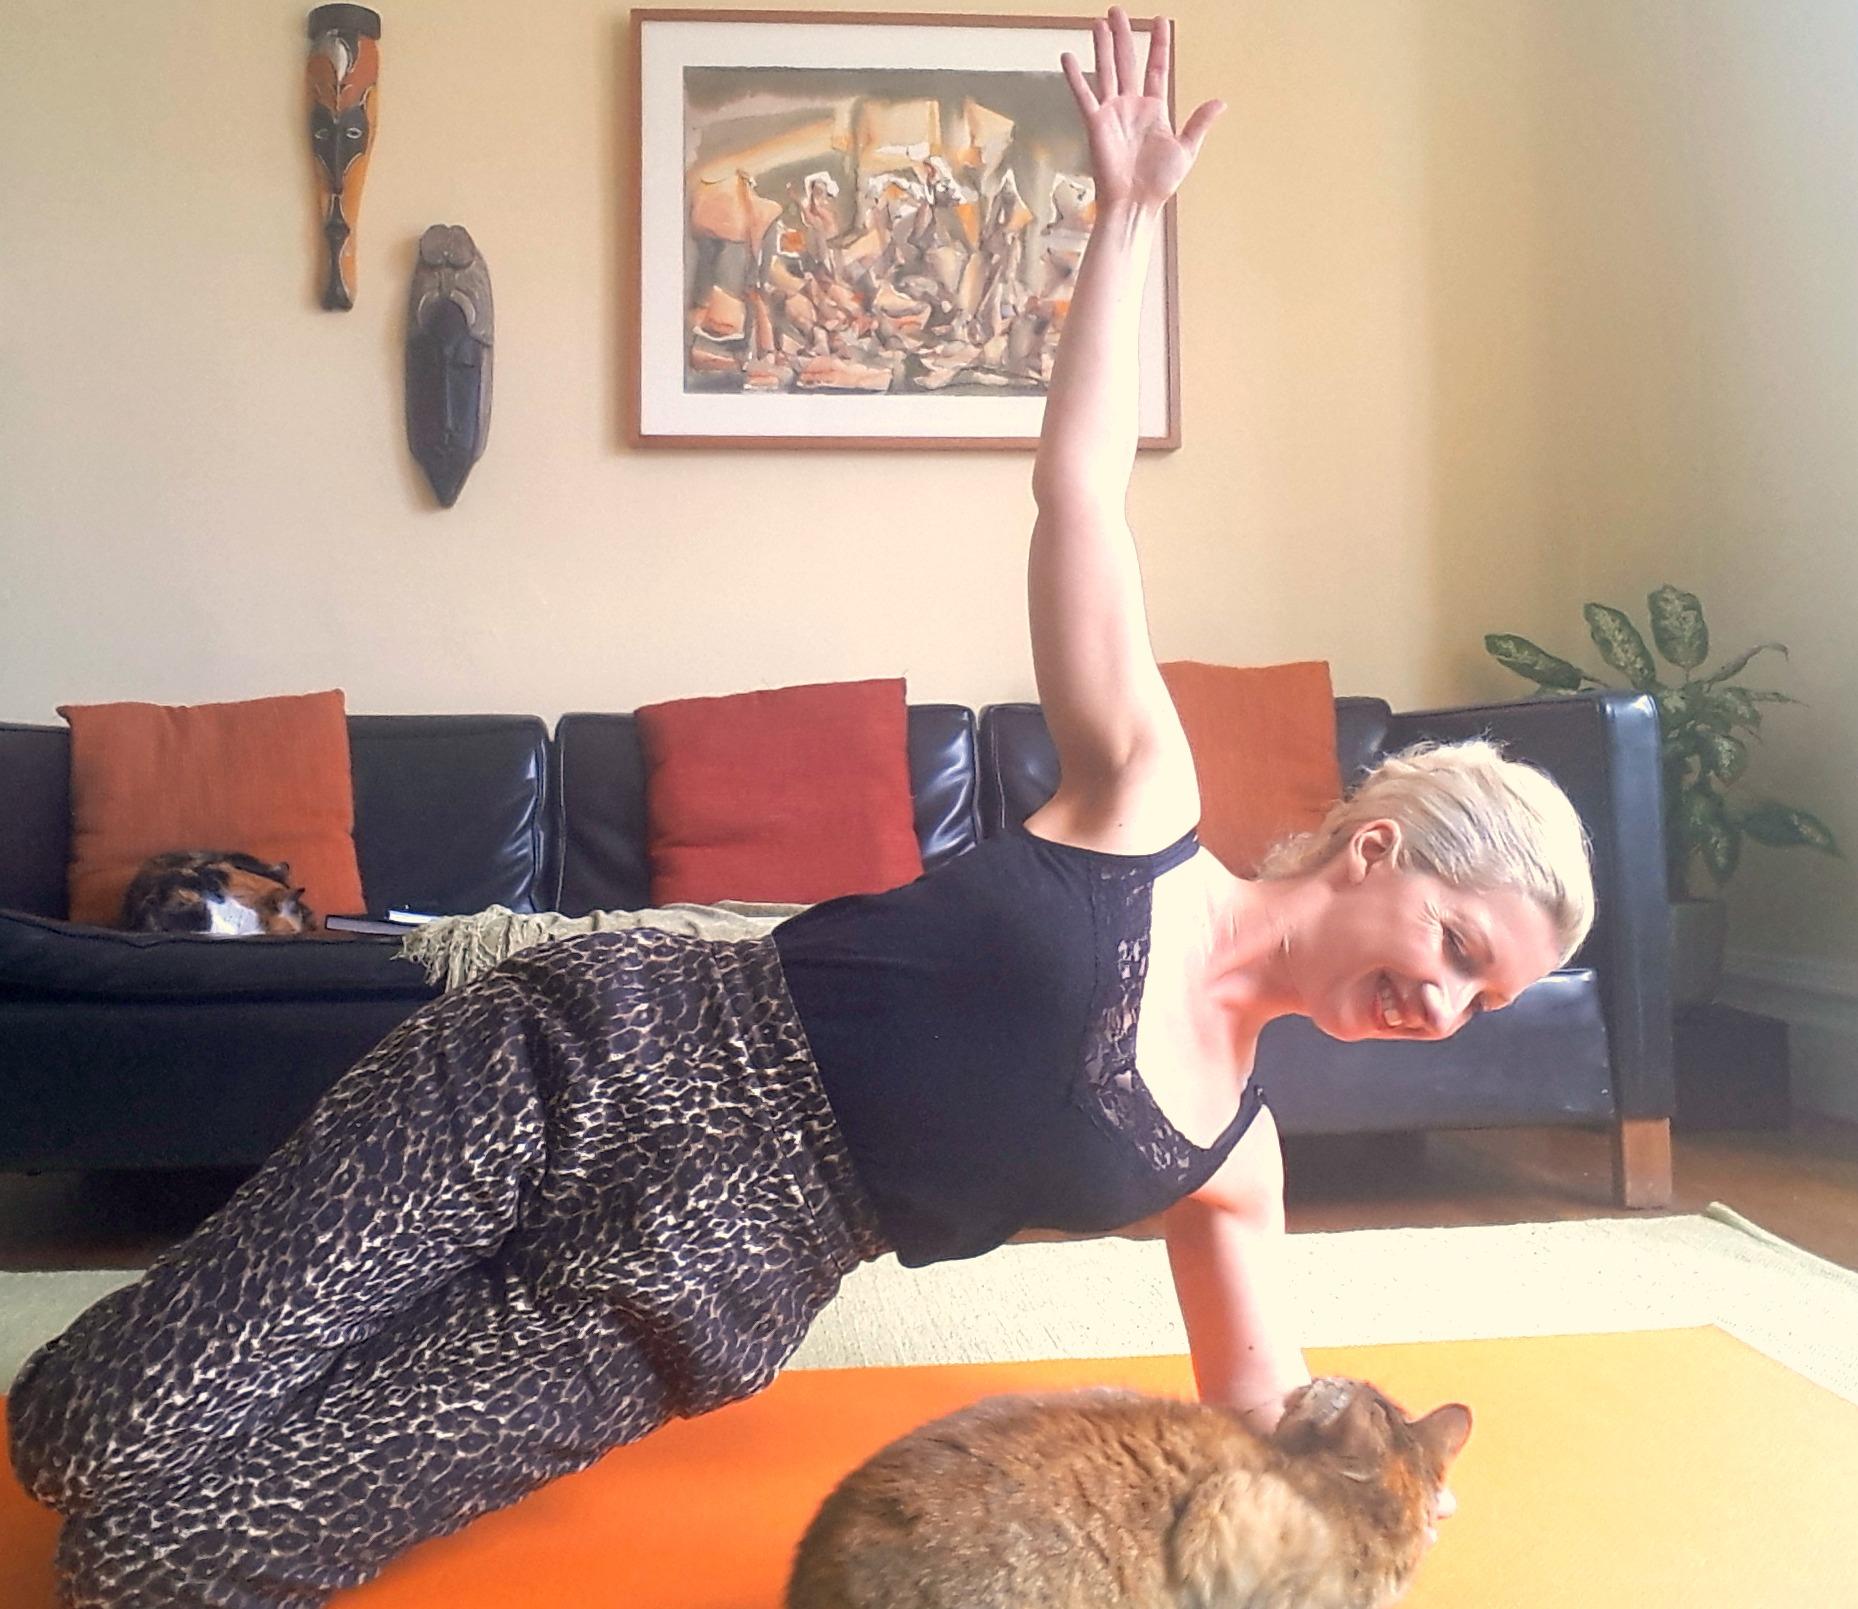 Marci+Bowman-knee-side-plank-with-cat.jpg